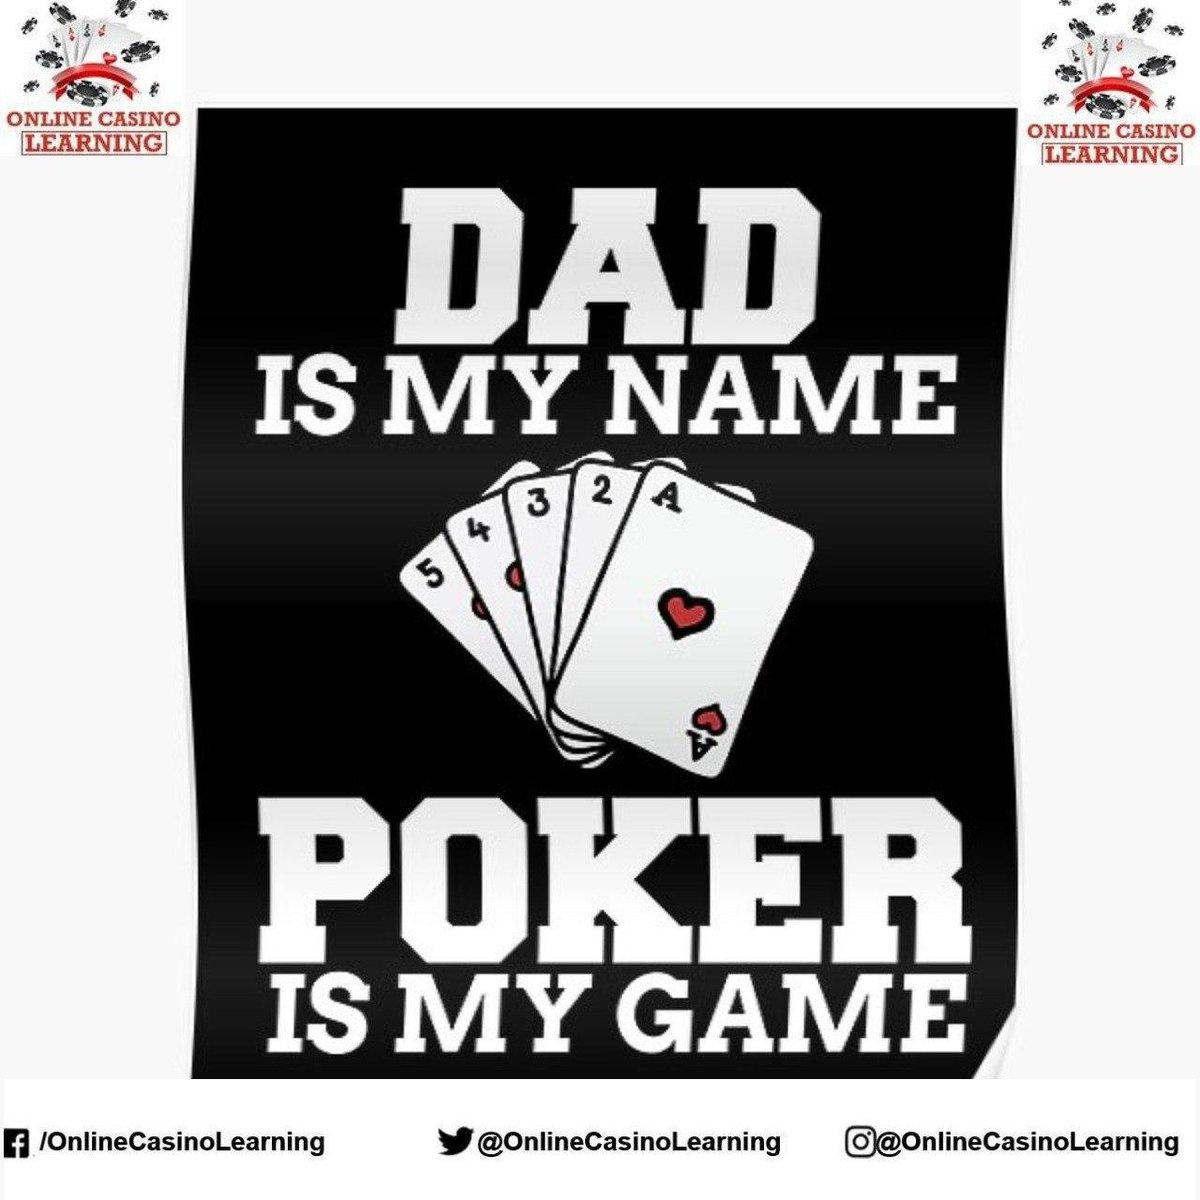 Pokertutto Hashtag On Twitter